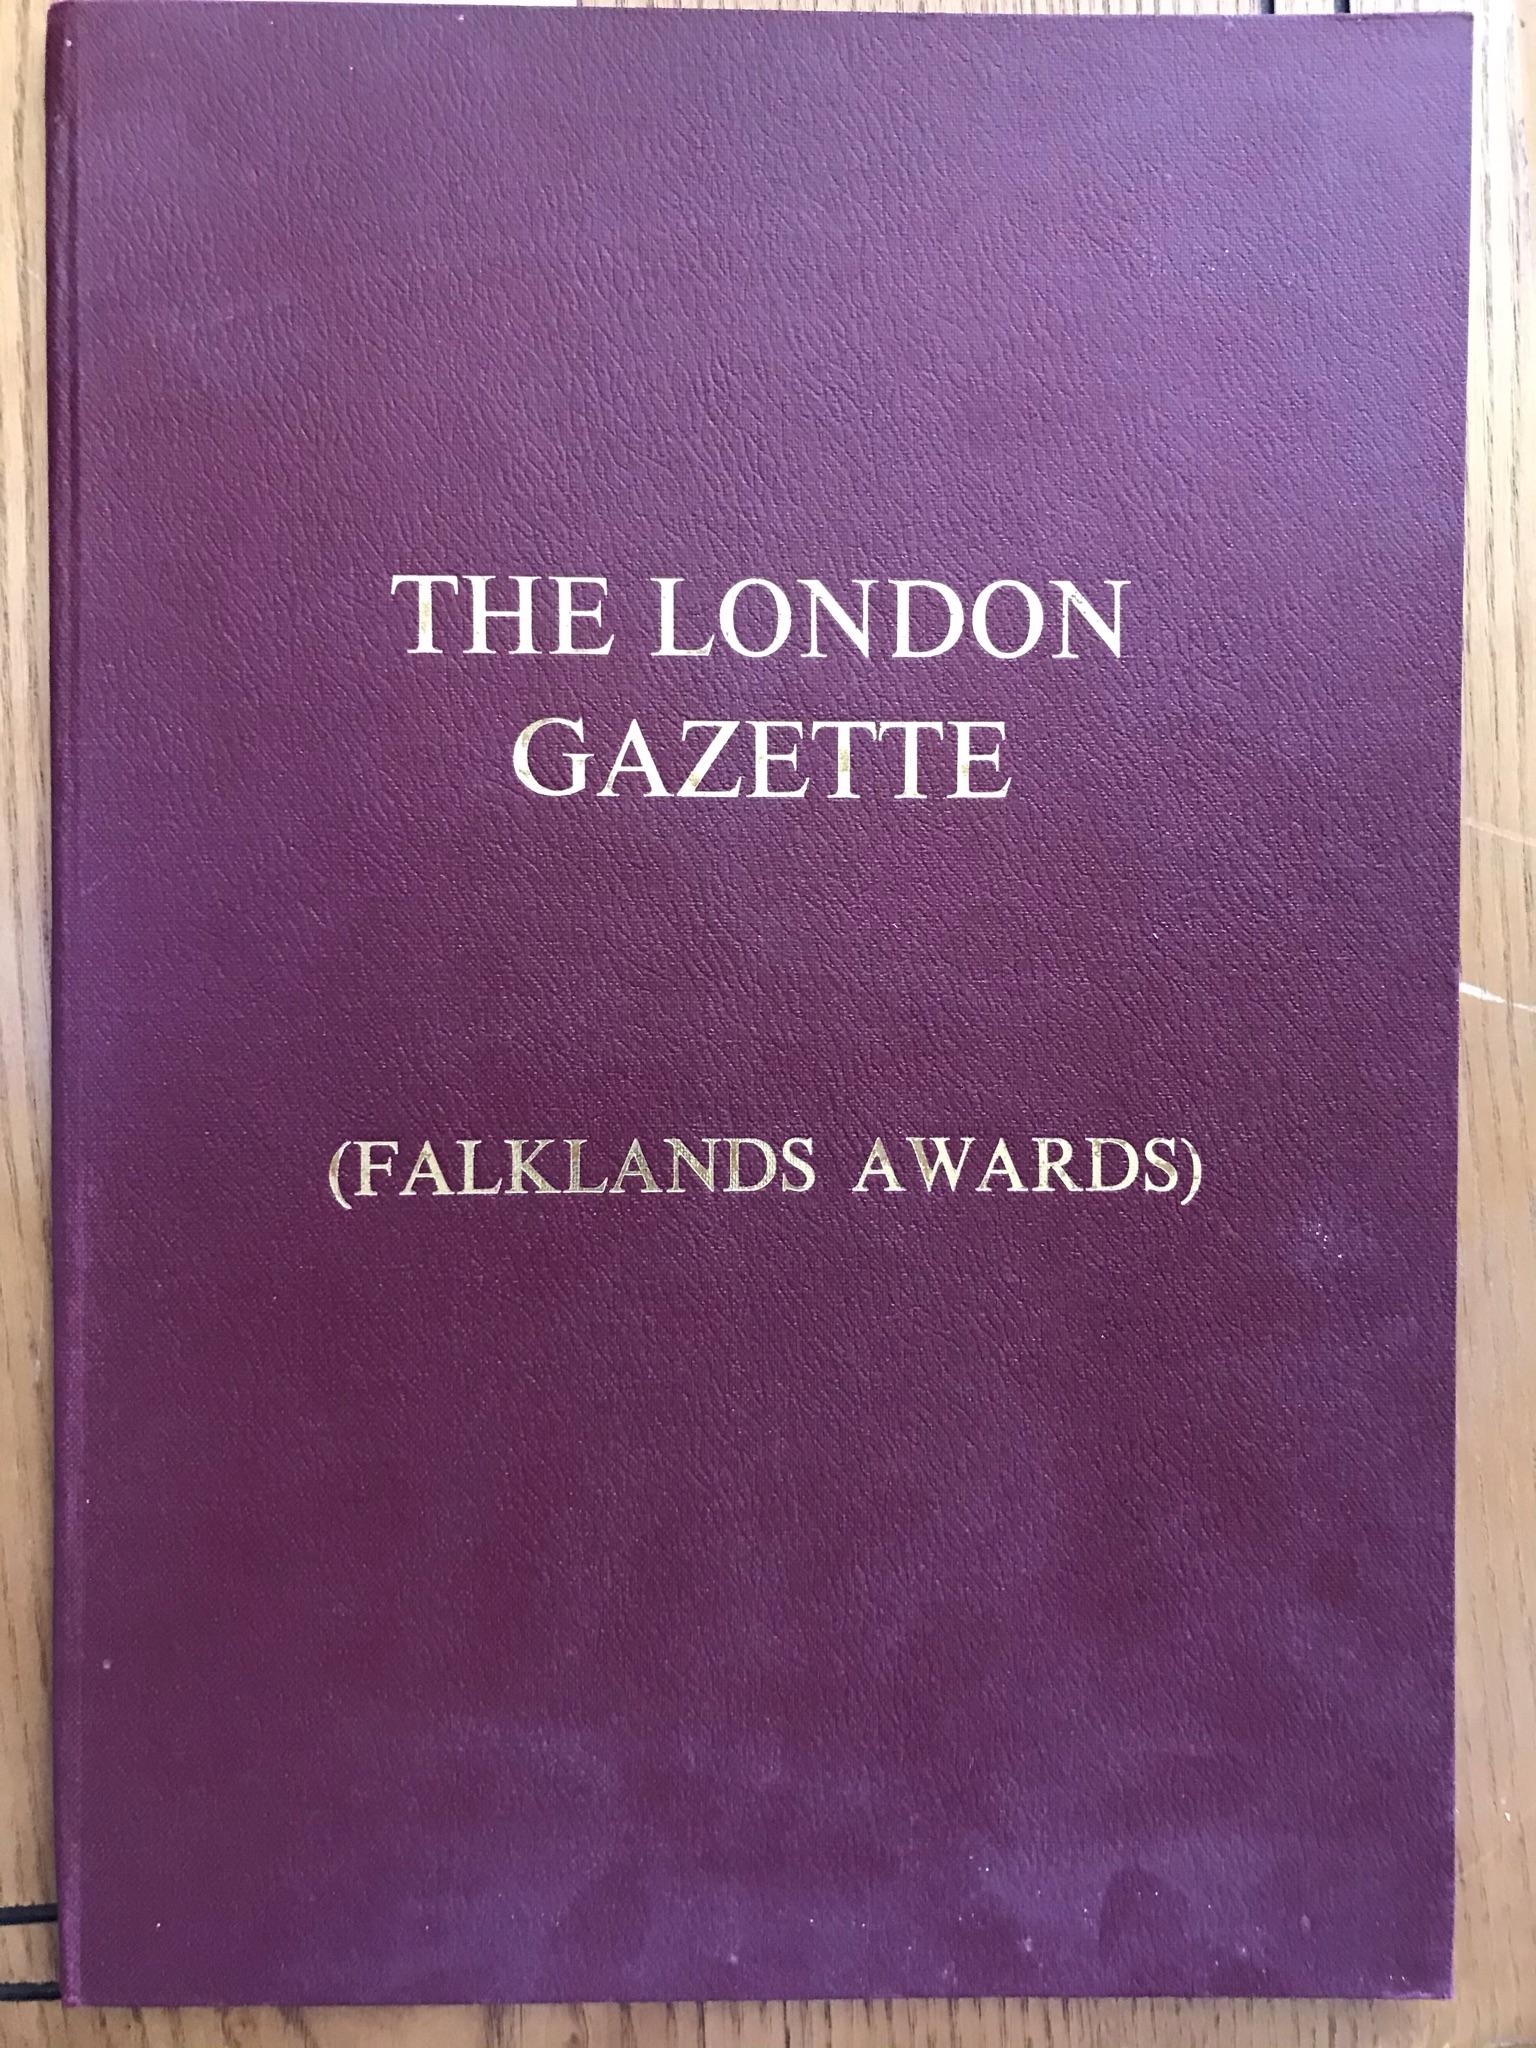 The London Gazette (Falklands Awards) published by H.M. Stationery Office. ISBN: 0-11-659134